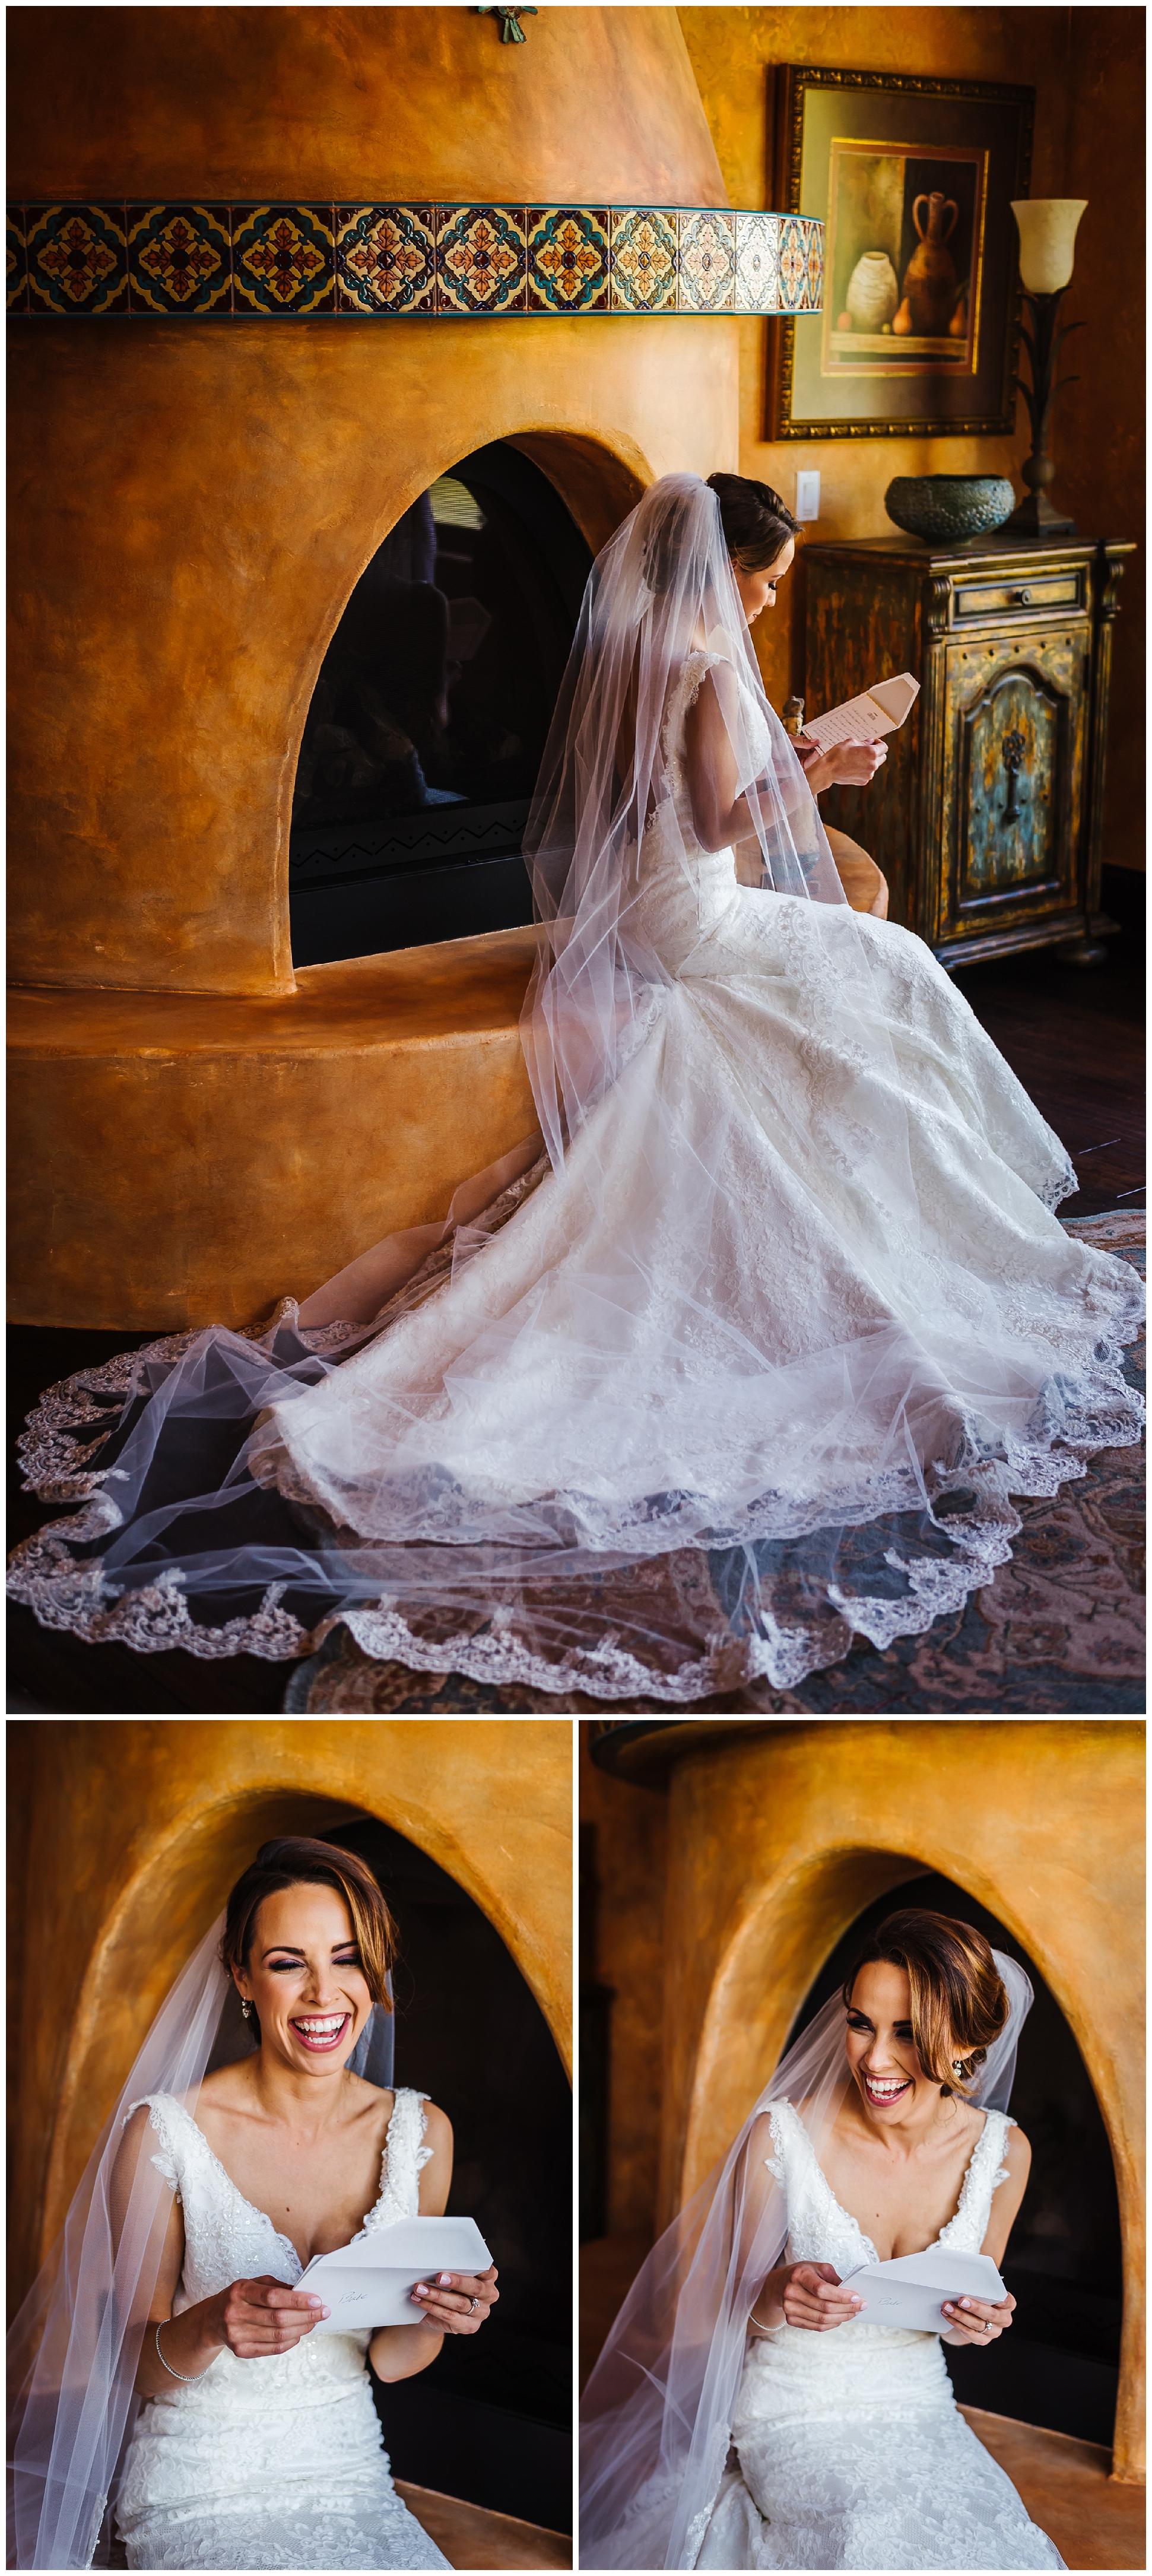 Tampa-luxury-wedding-photographer-mision-lago-private-estate_0012.jpg